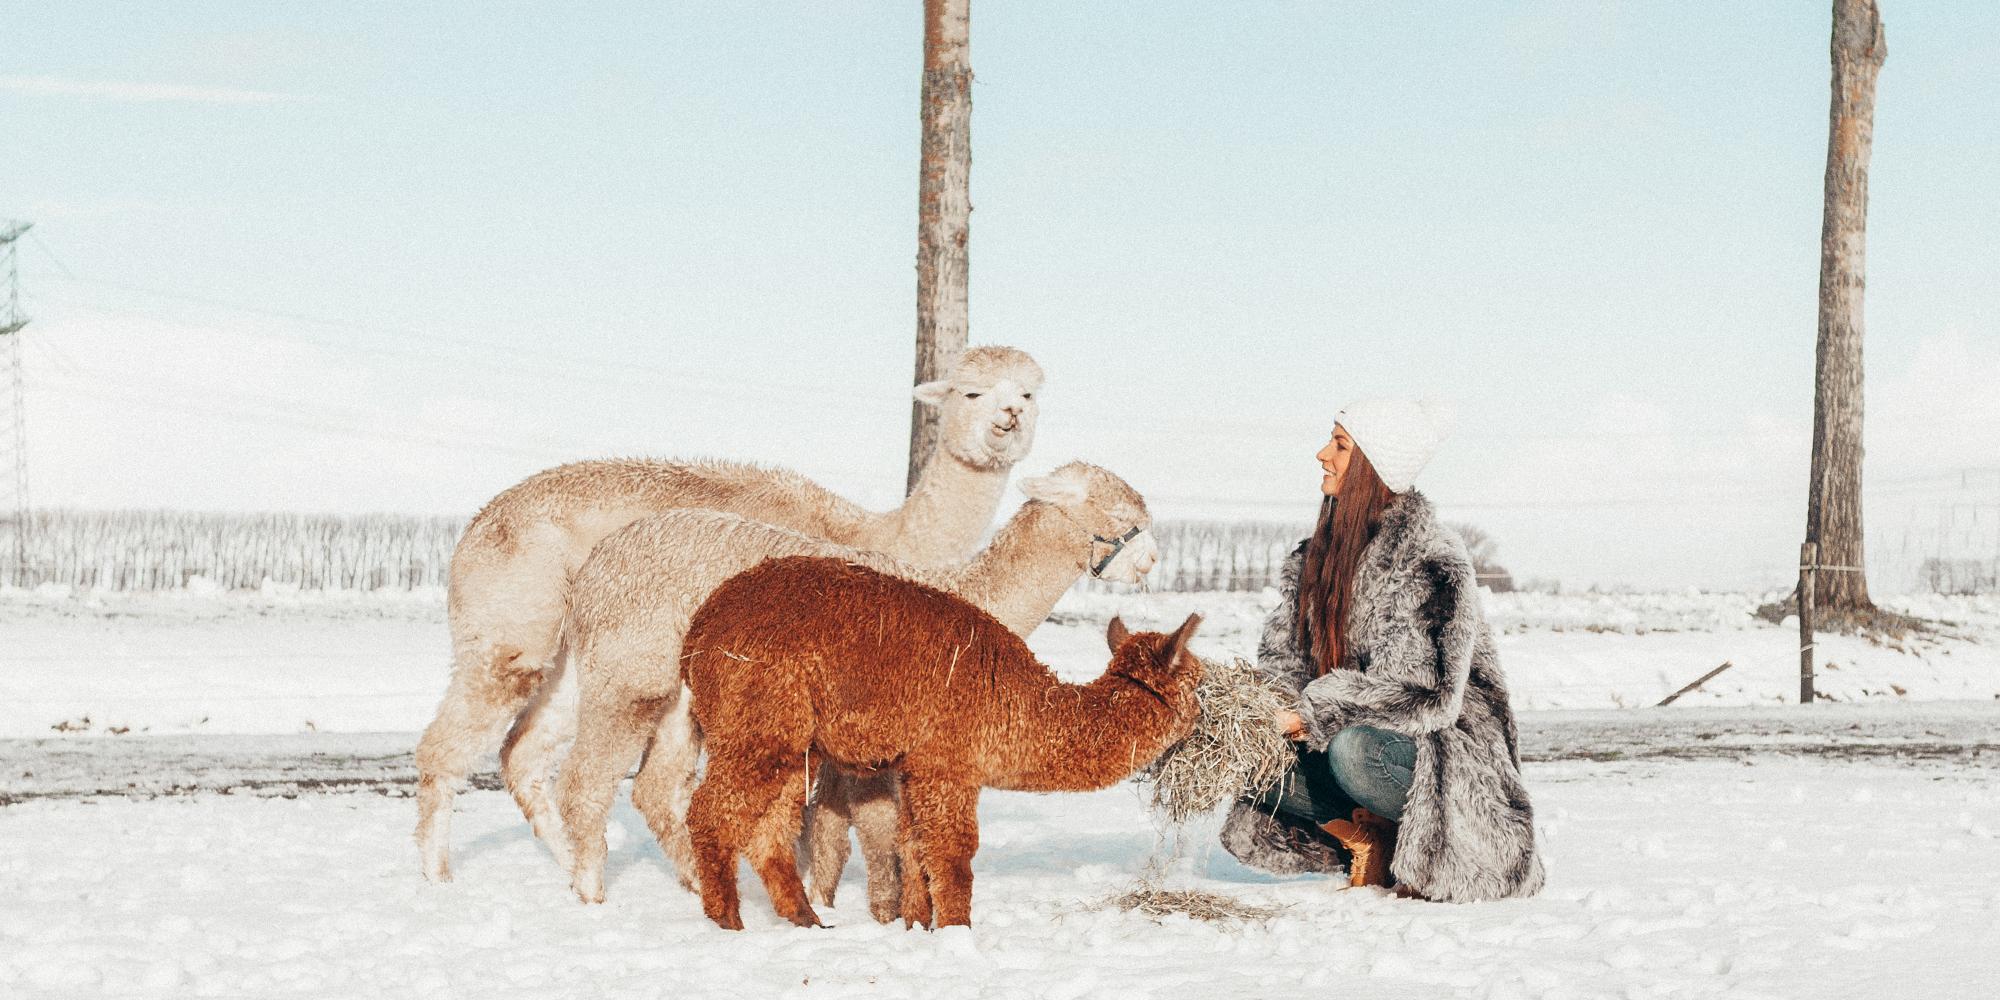 alpaca's in the snow winter